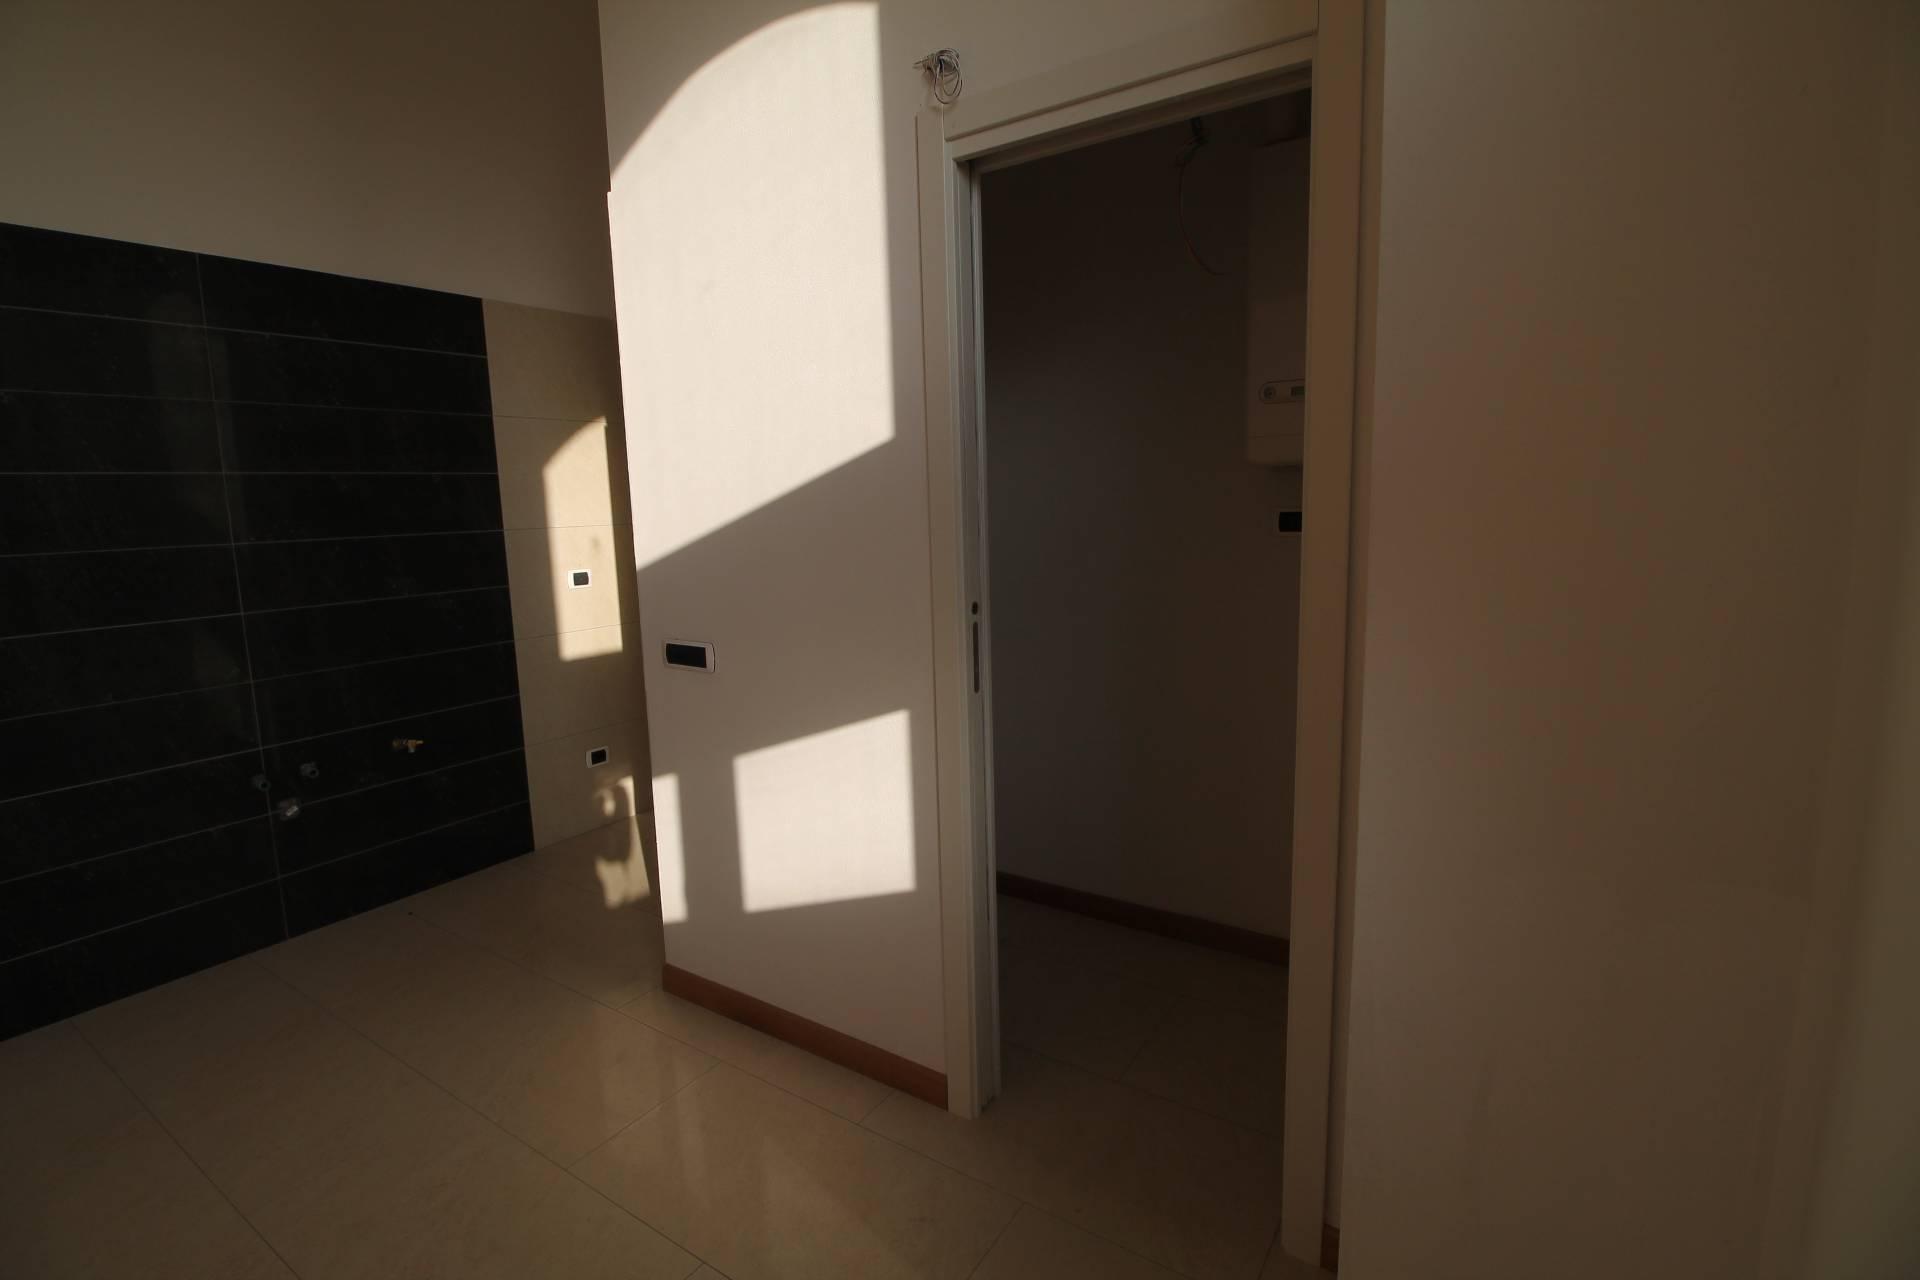 Appartamento in vendita, rif. V1216B